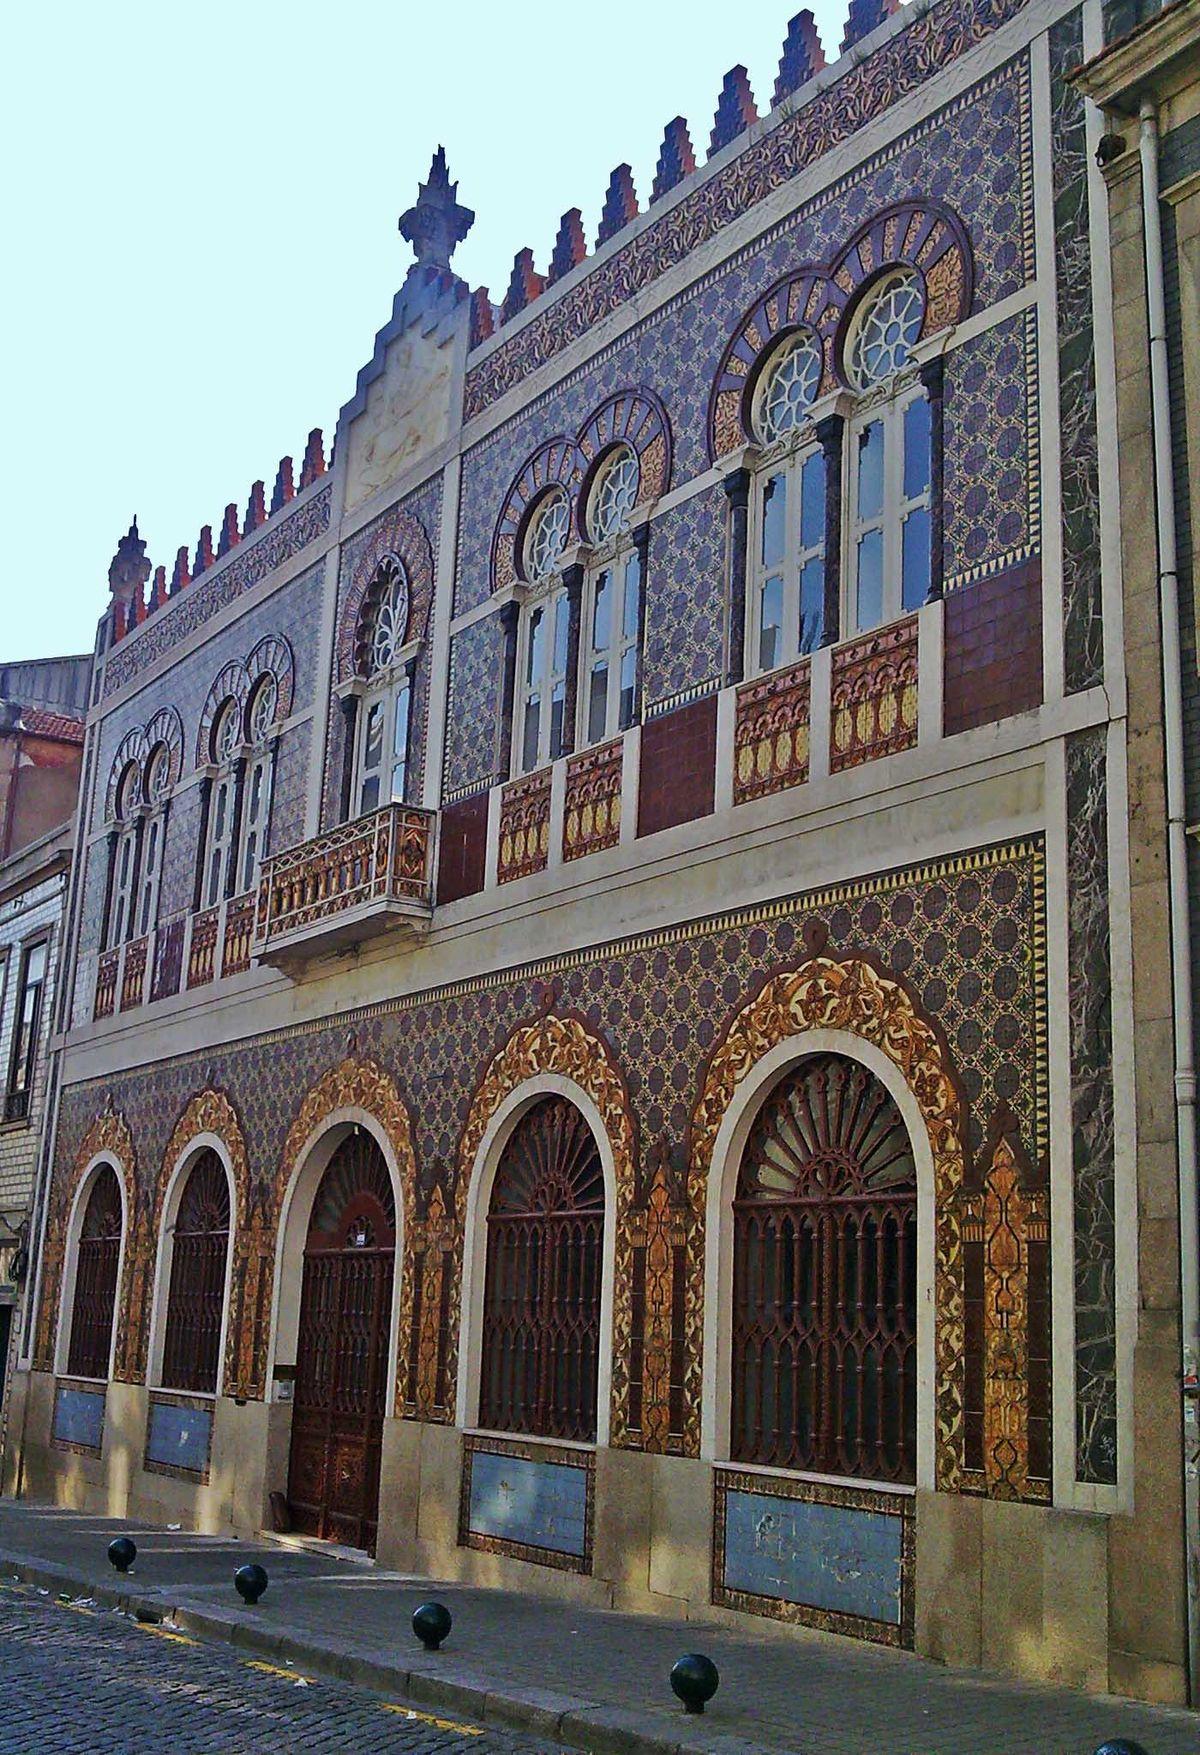 Rua de jos falc o wikip dia a enciclop dia livre for Edificio de los azulejos